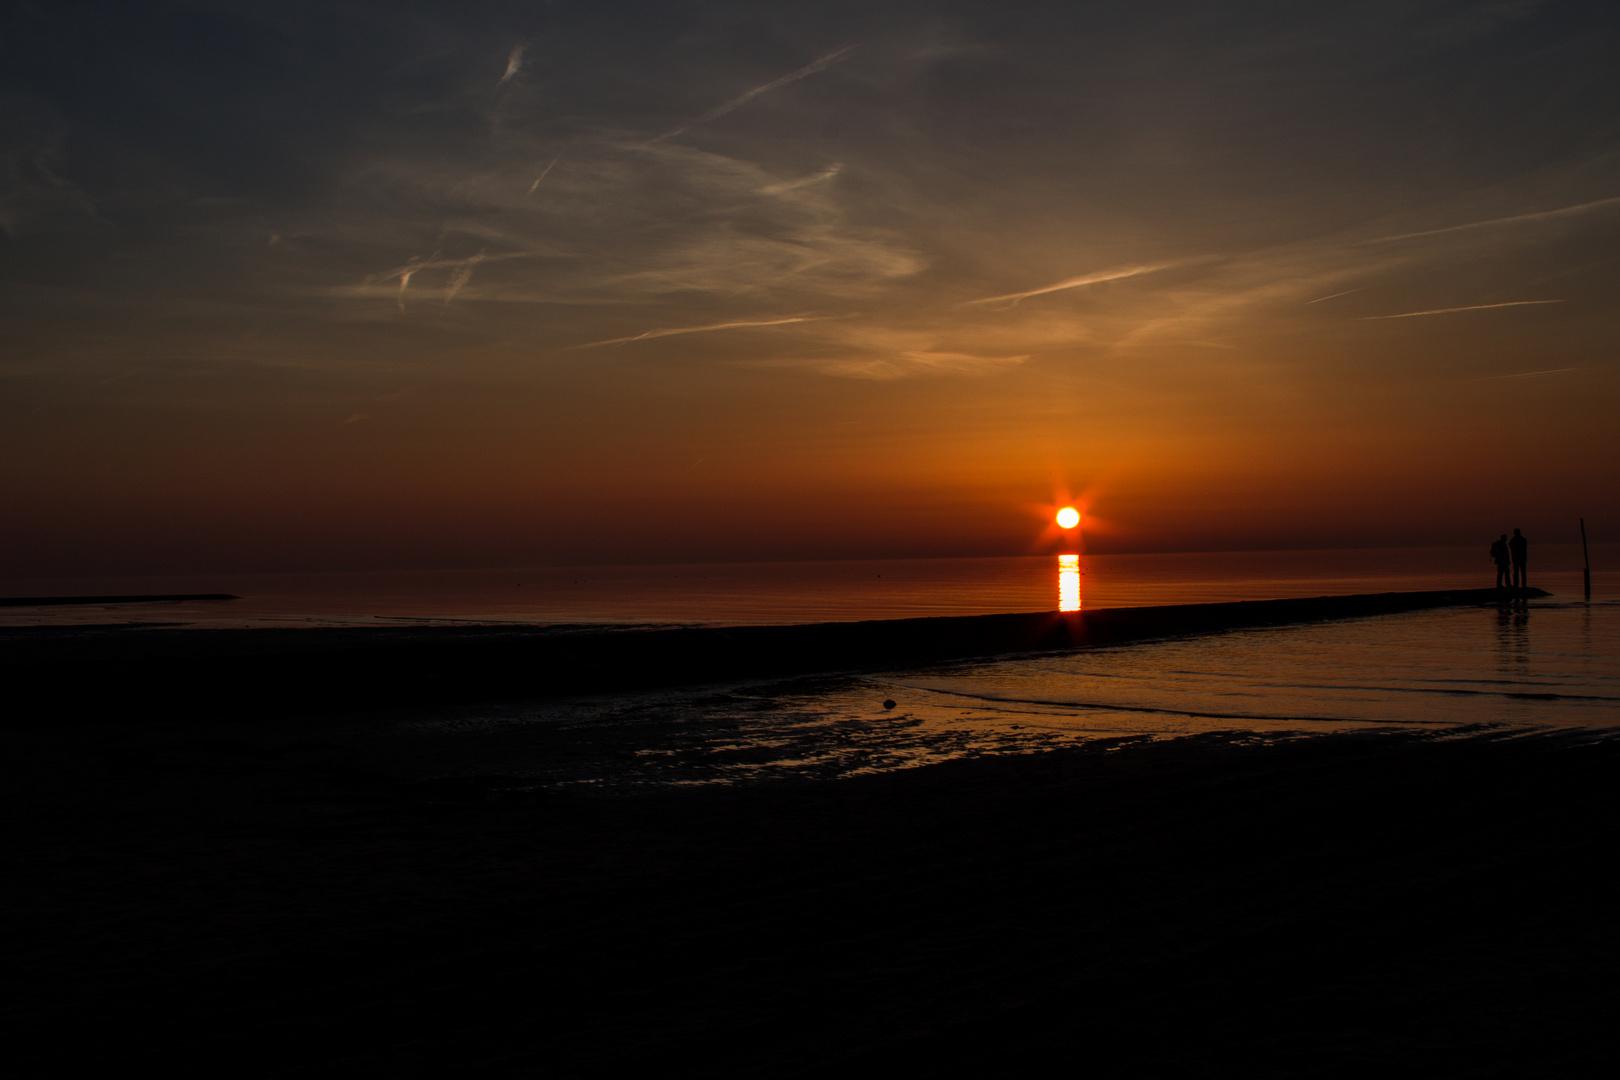 Sonnenuntergang Sahlenburg 2